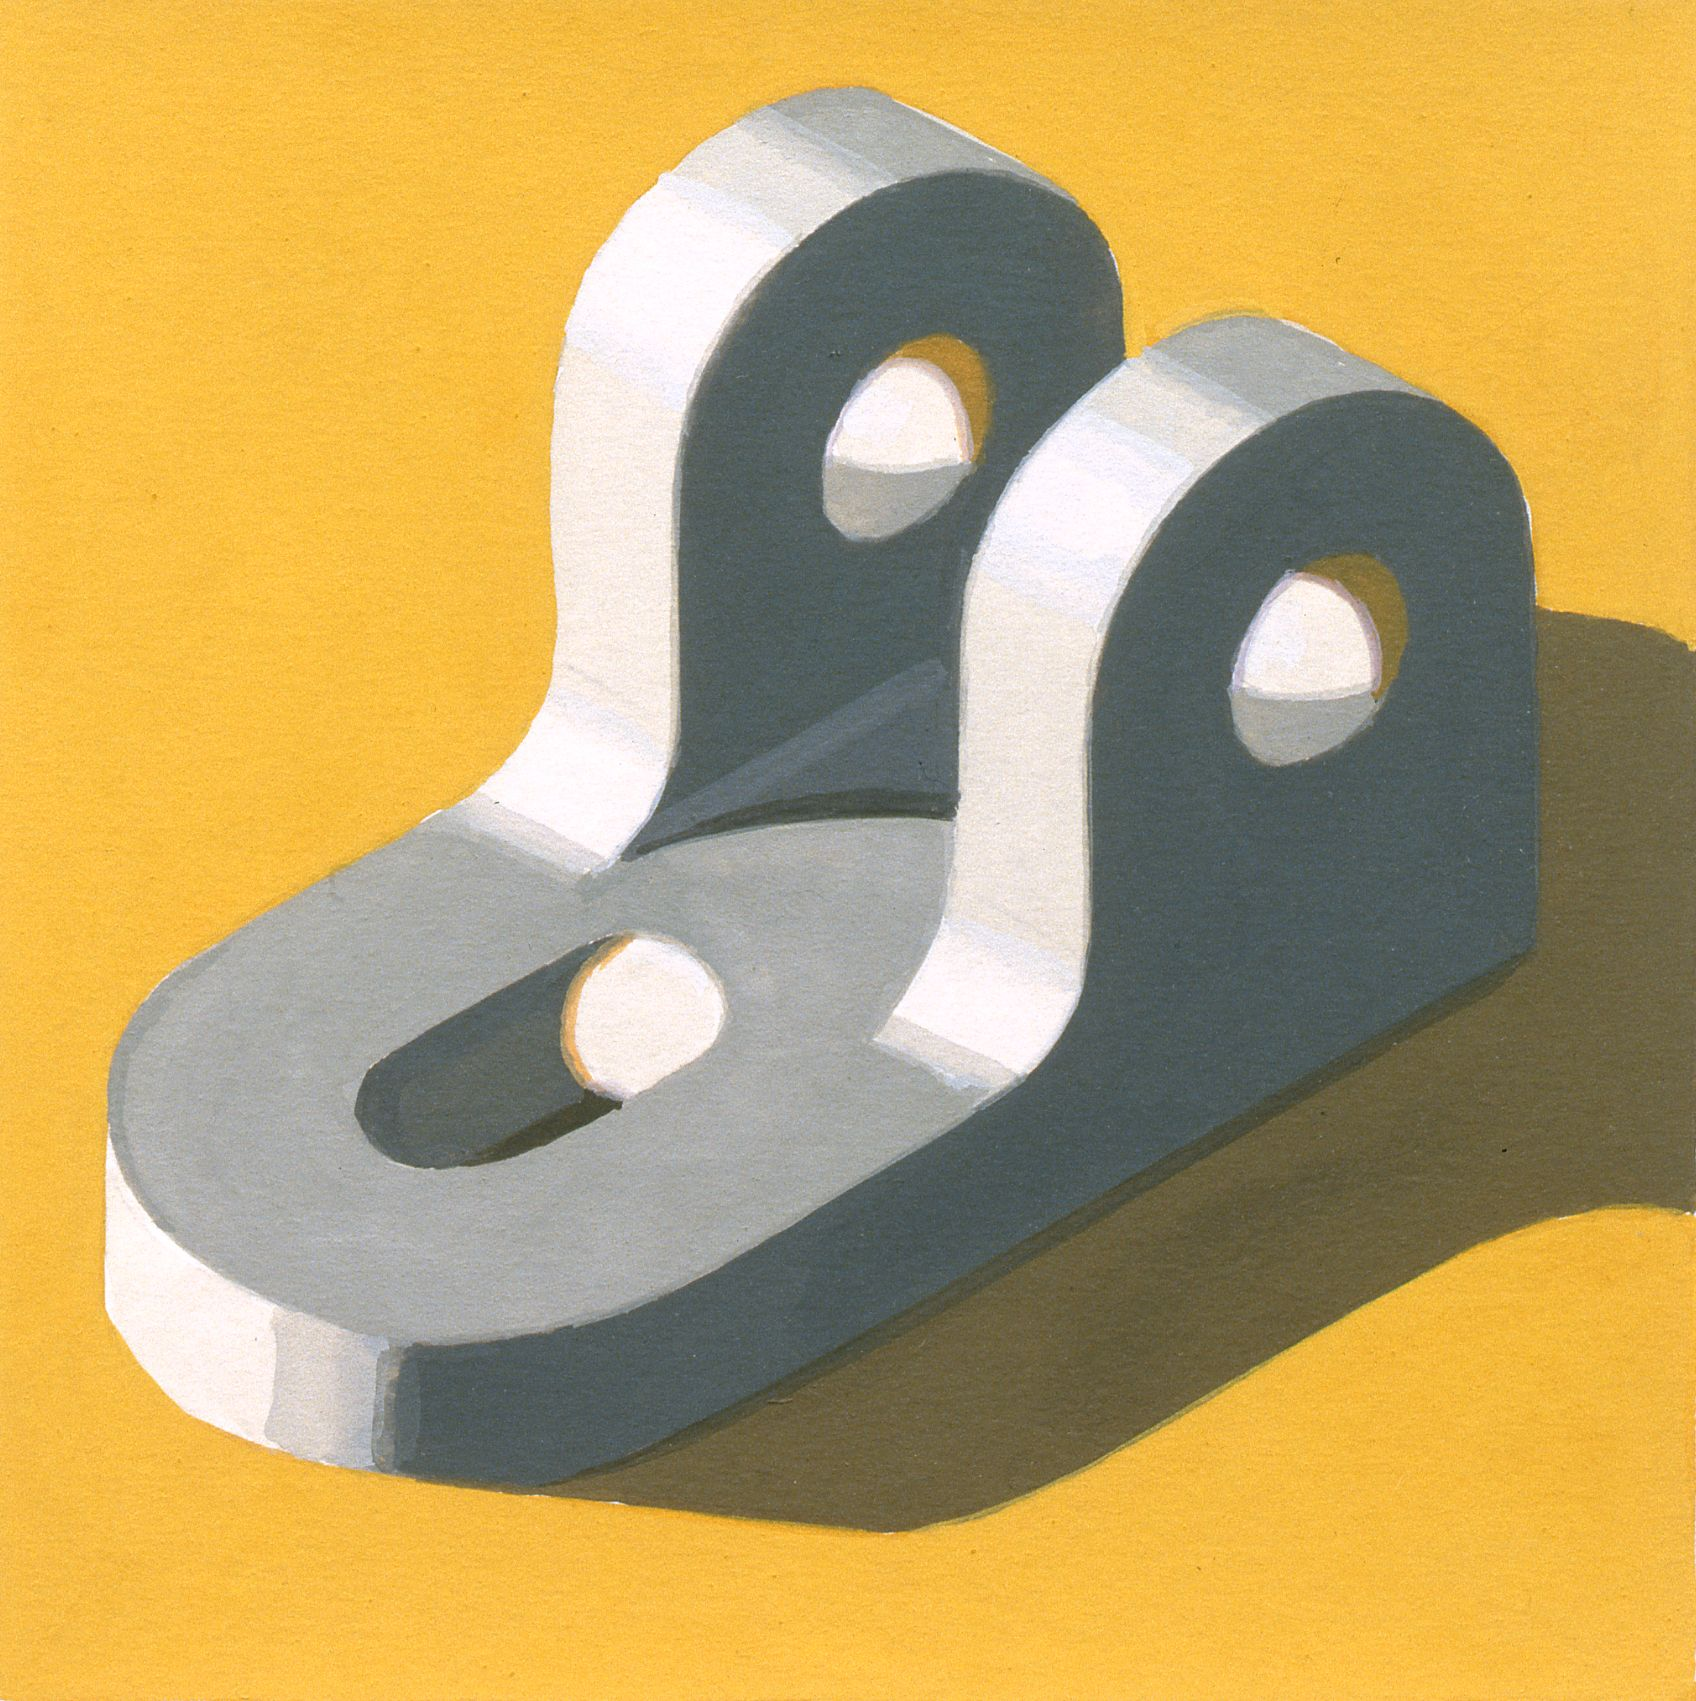 Robert Cottingham, Component XXXII, 2005, gouache on paper, 5 1/2 x 5 1/2 inches